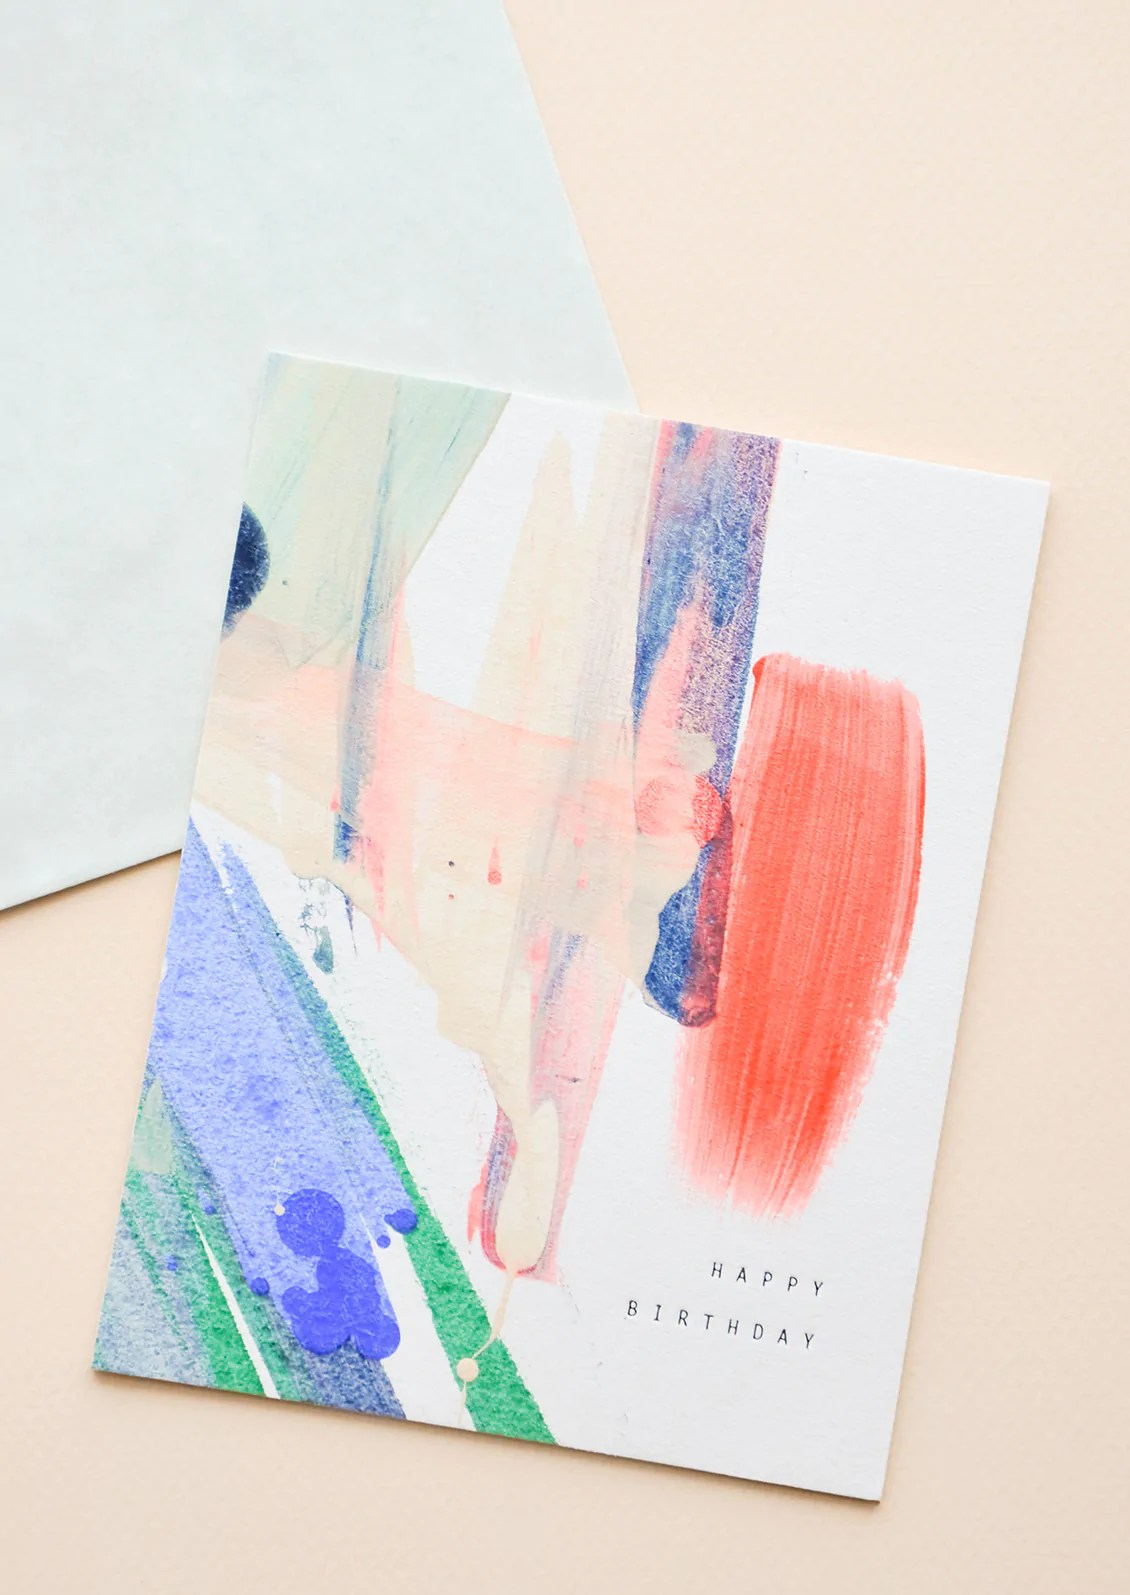 Birthday Card Painting : birthday, painting, Moglea, Painted, Paintswirl, Happy, Birthday